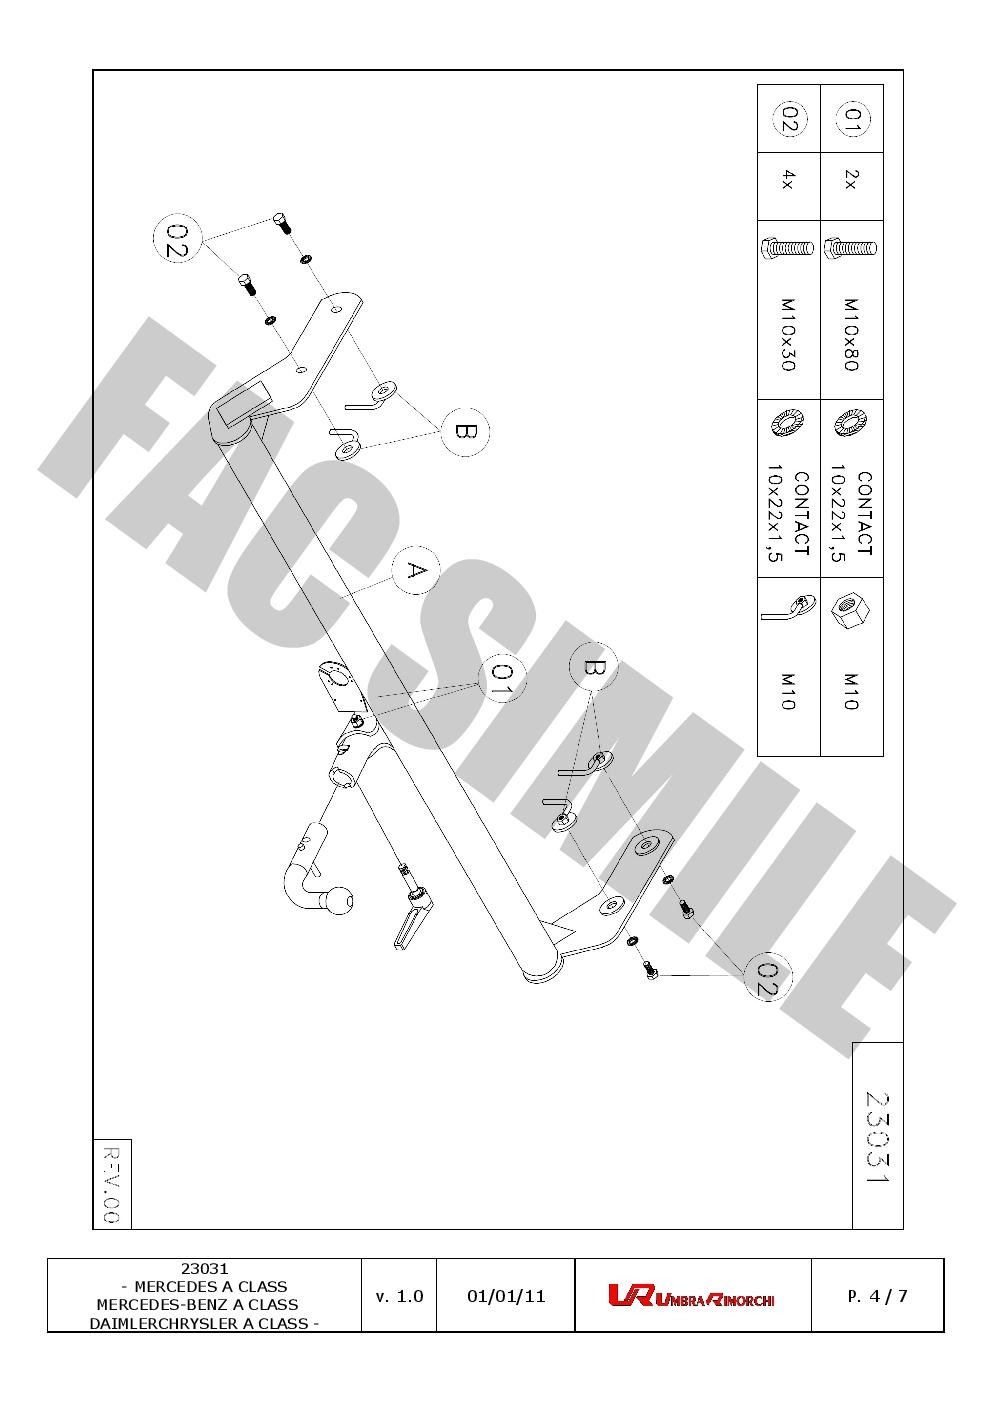 Detachable Towbar 13 Pin Kit C2 Wiring For Mercedes A Class Mpv Diagram